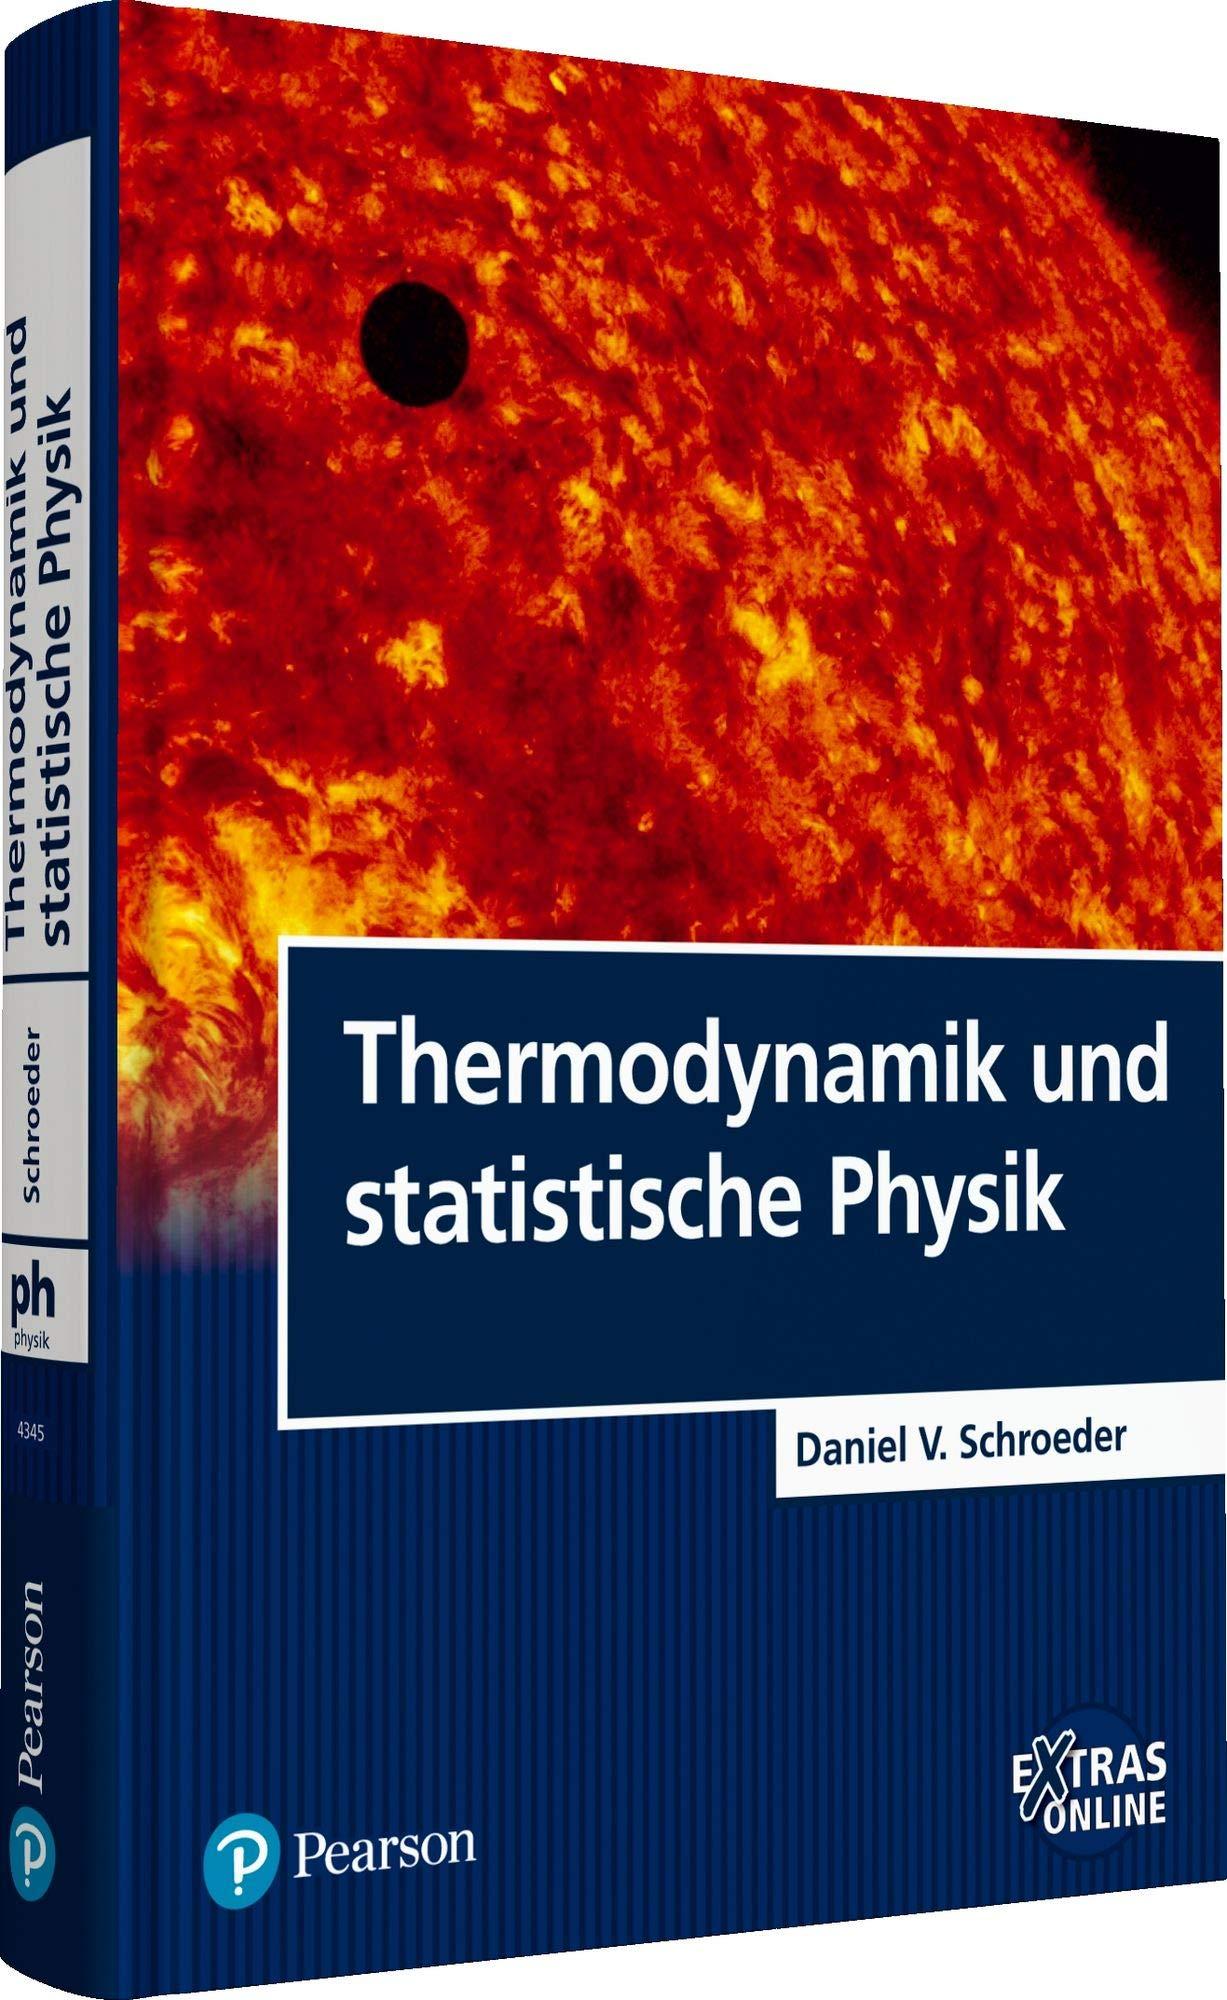 Thermodynamik und statistische Physik (Pearson Studium - Physik)